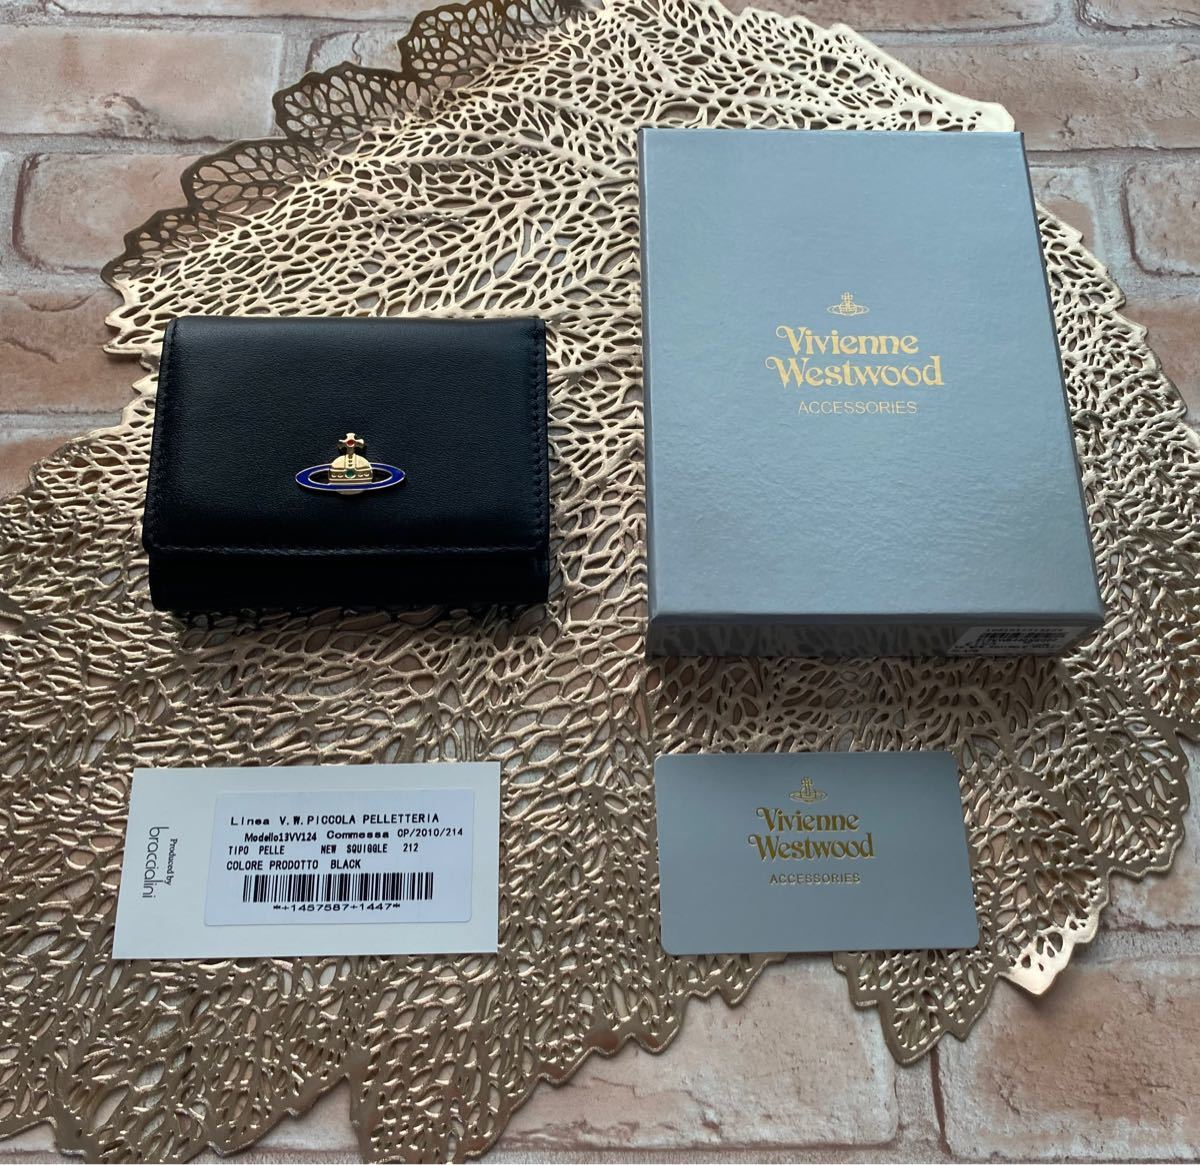 Vivienne Westwood ヴィヴィアンウエストウッド 三つ折り財布 黒